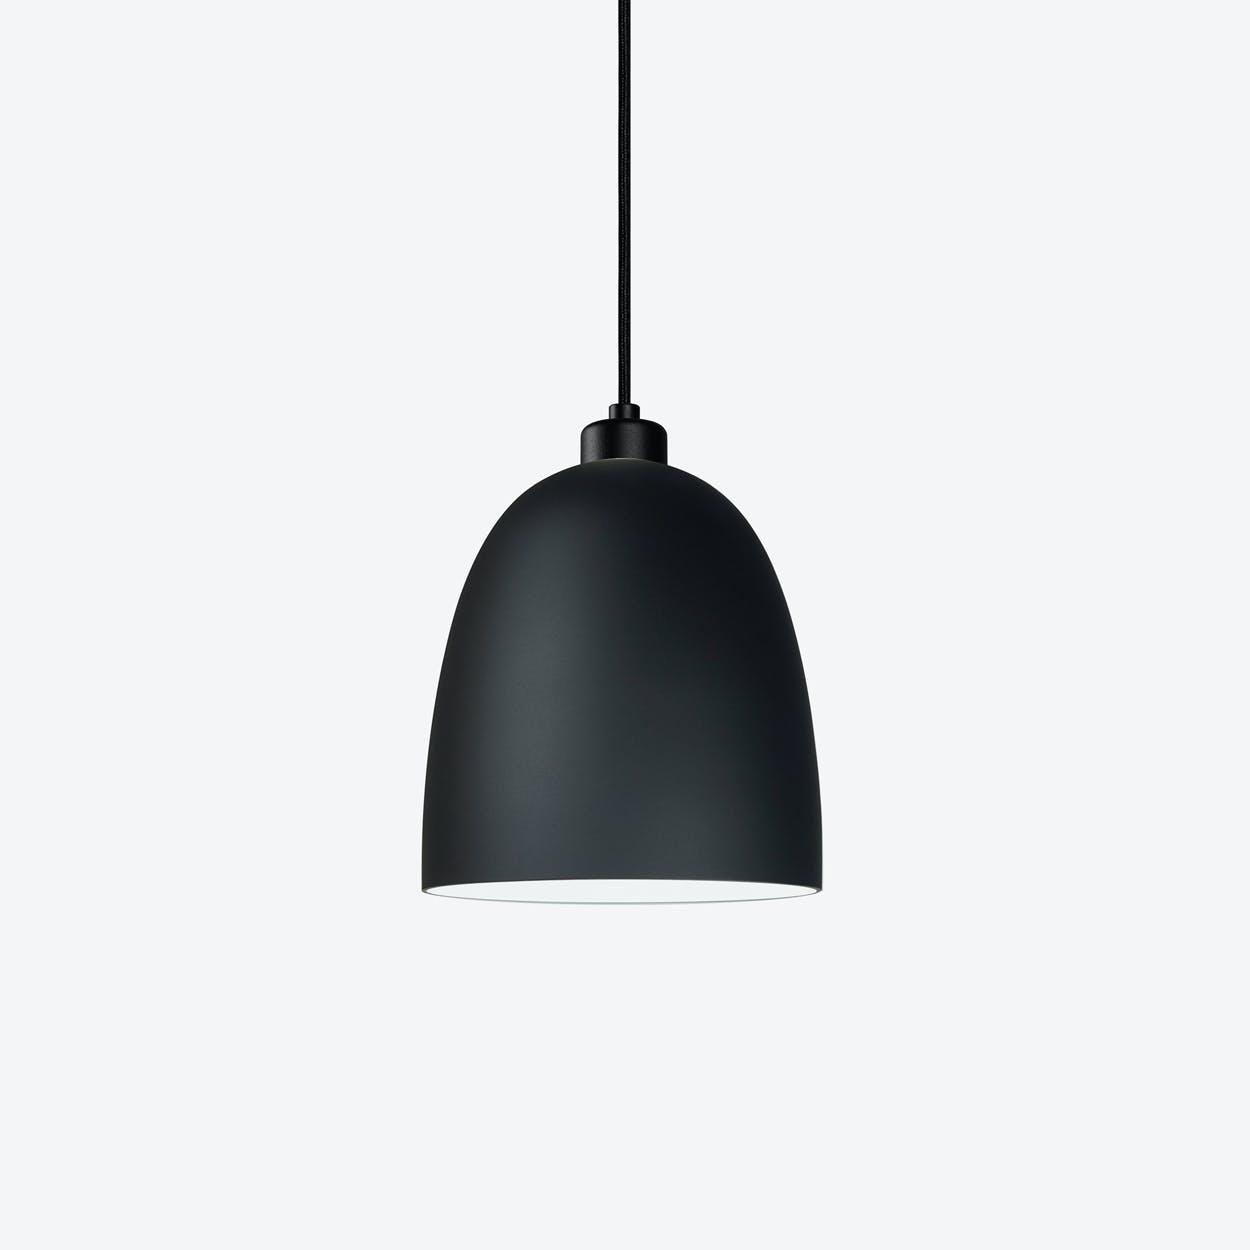 AWA Single Pendant Light in Matte Black